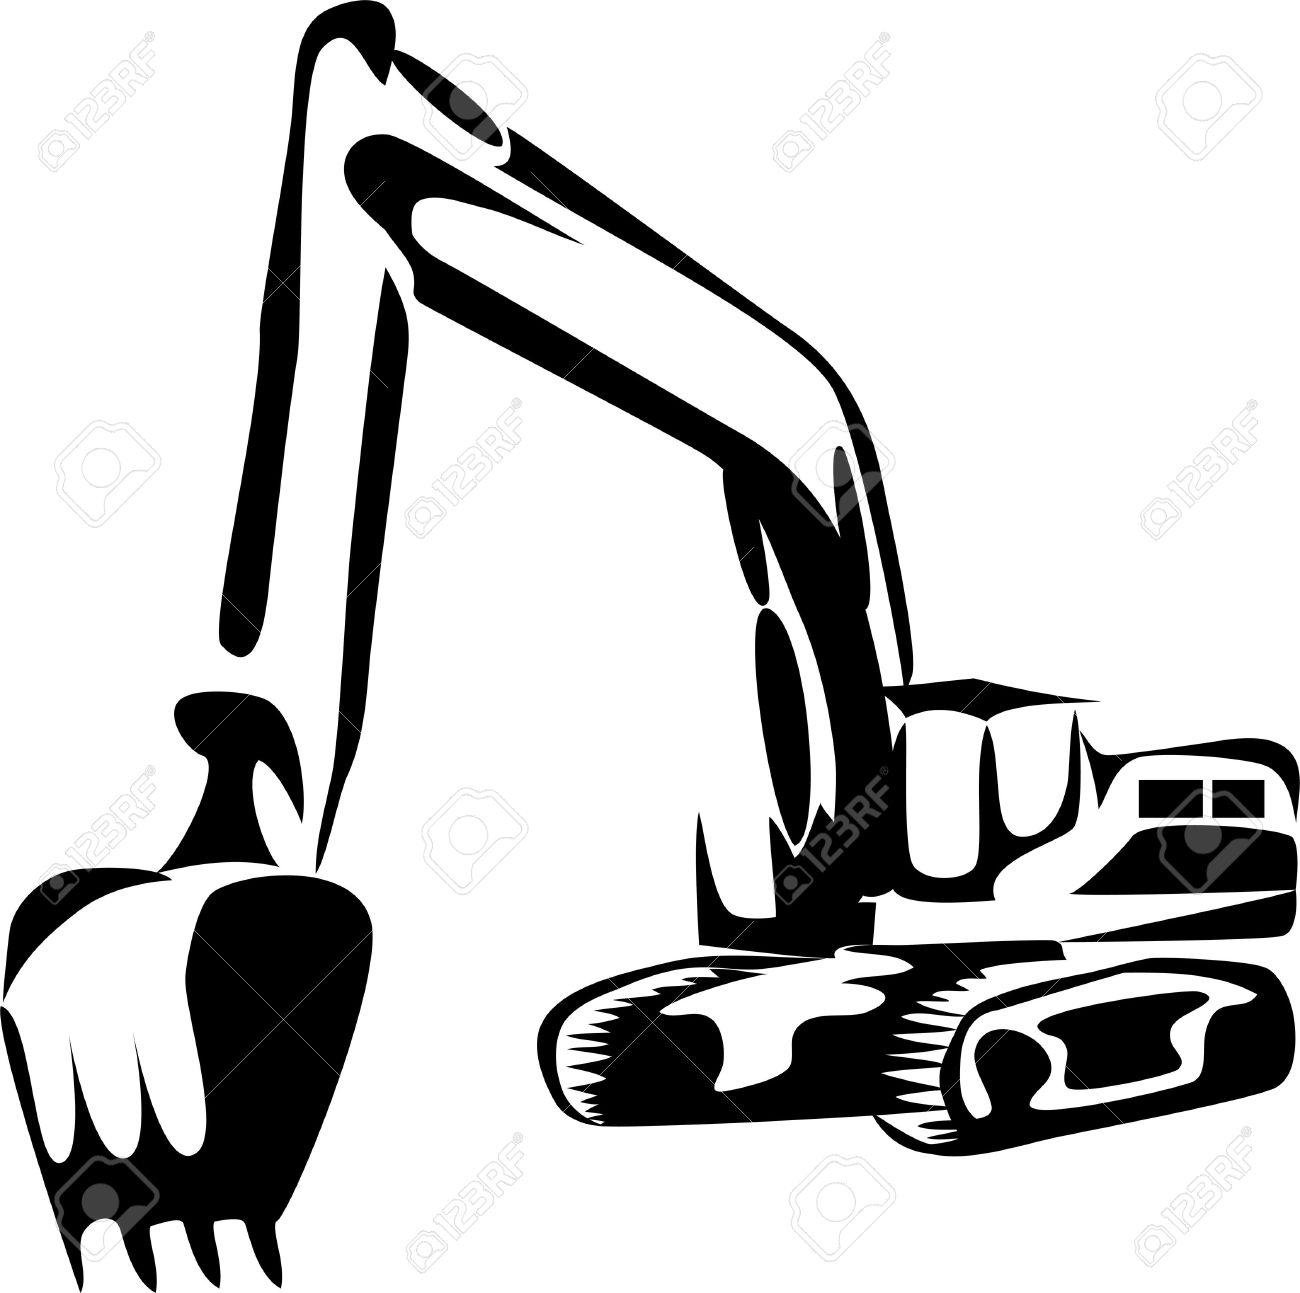 758 Excavator free clipart.